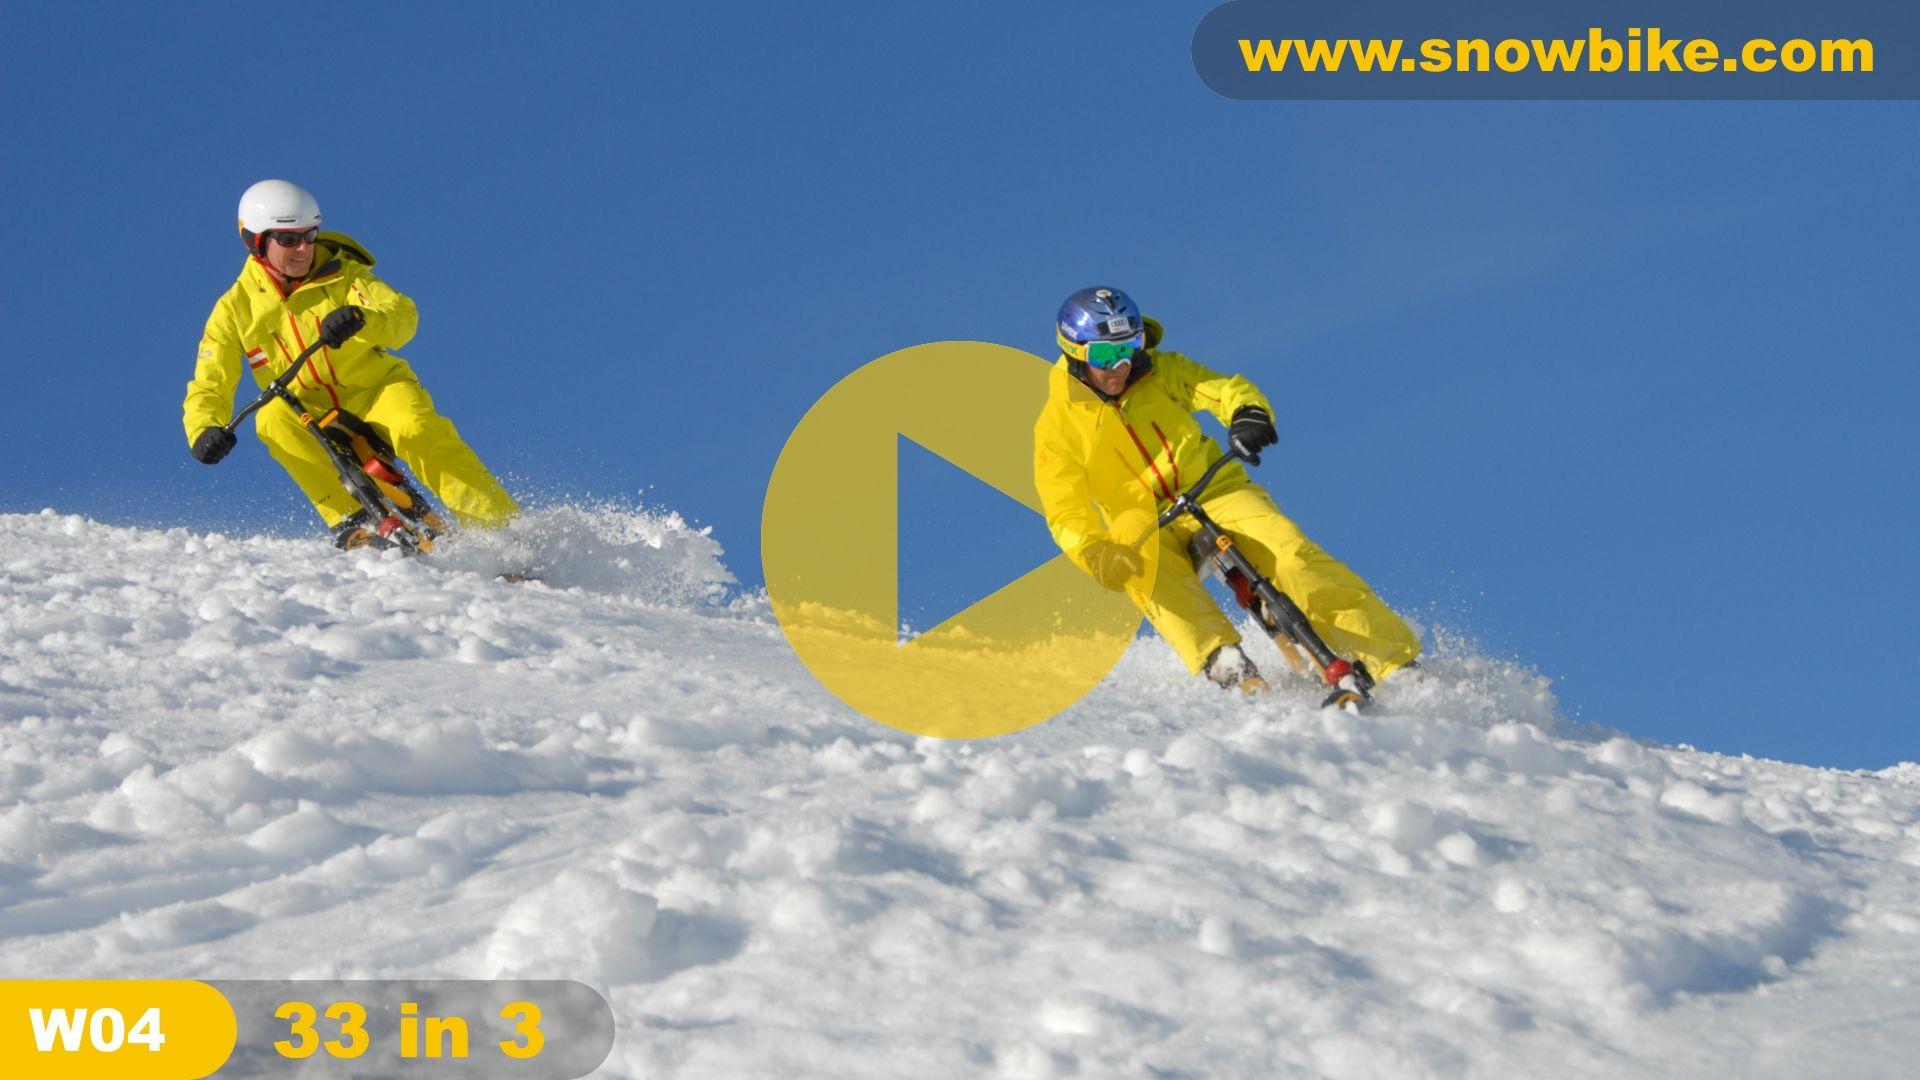 brenter-snowbike-world-record-33-in-3-coverF8326936-73F8-6A99-92C5-611147D7205D.jpg